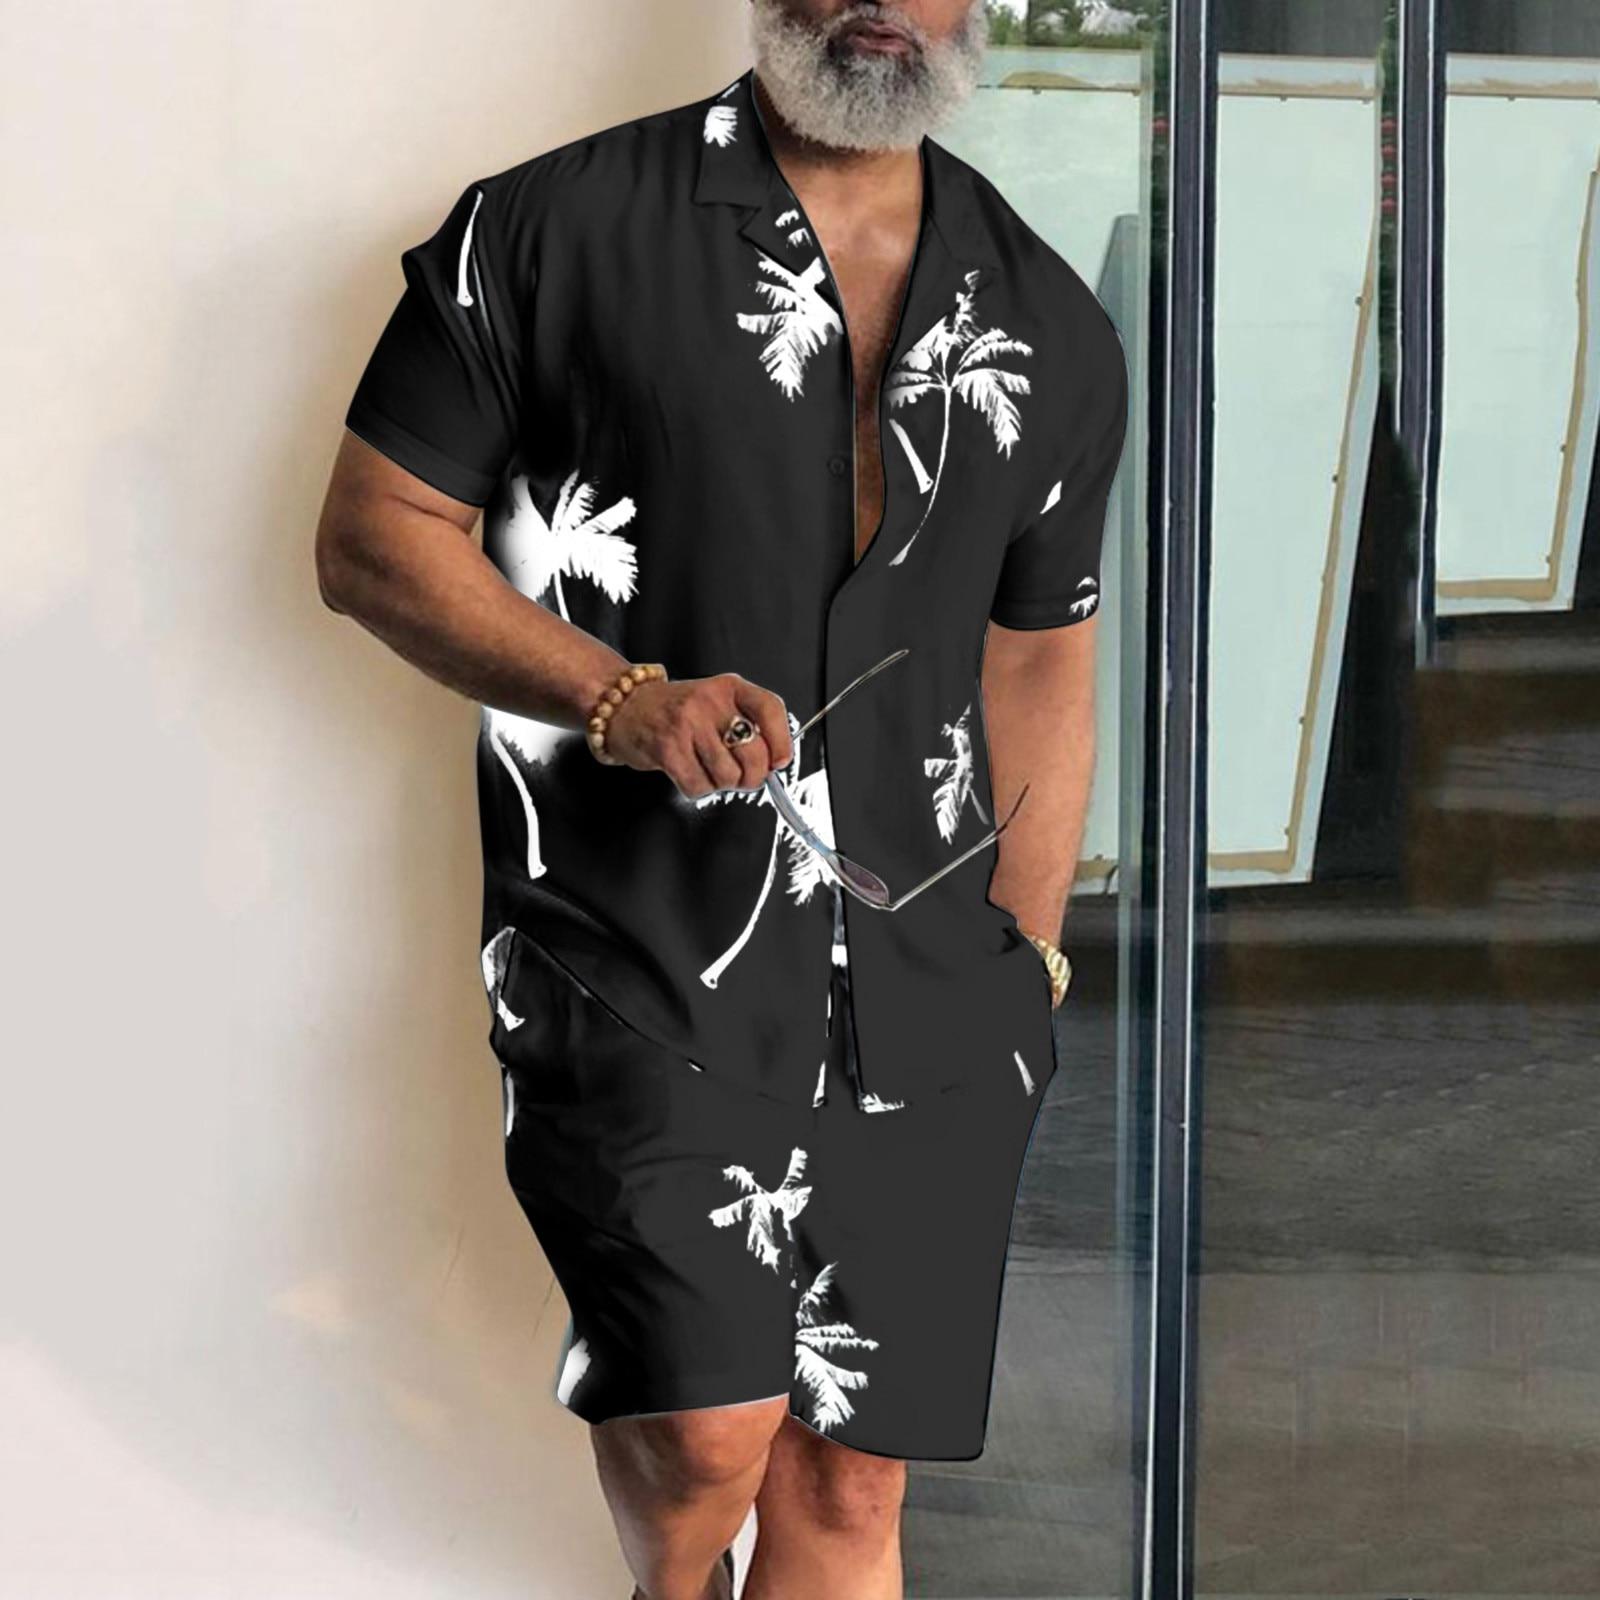 Short Sleeve Palm Tree Printed Shirt Men Causal Blouse Shorts Suit Summer 2 Piece Clothing Beach